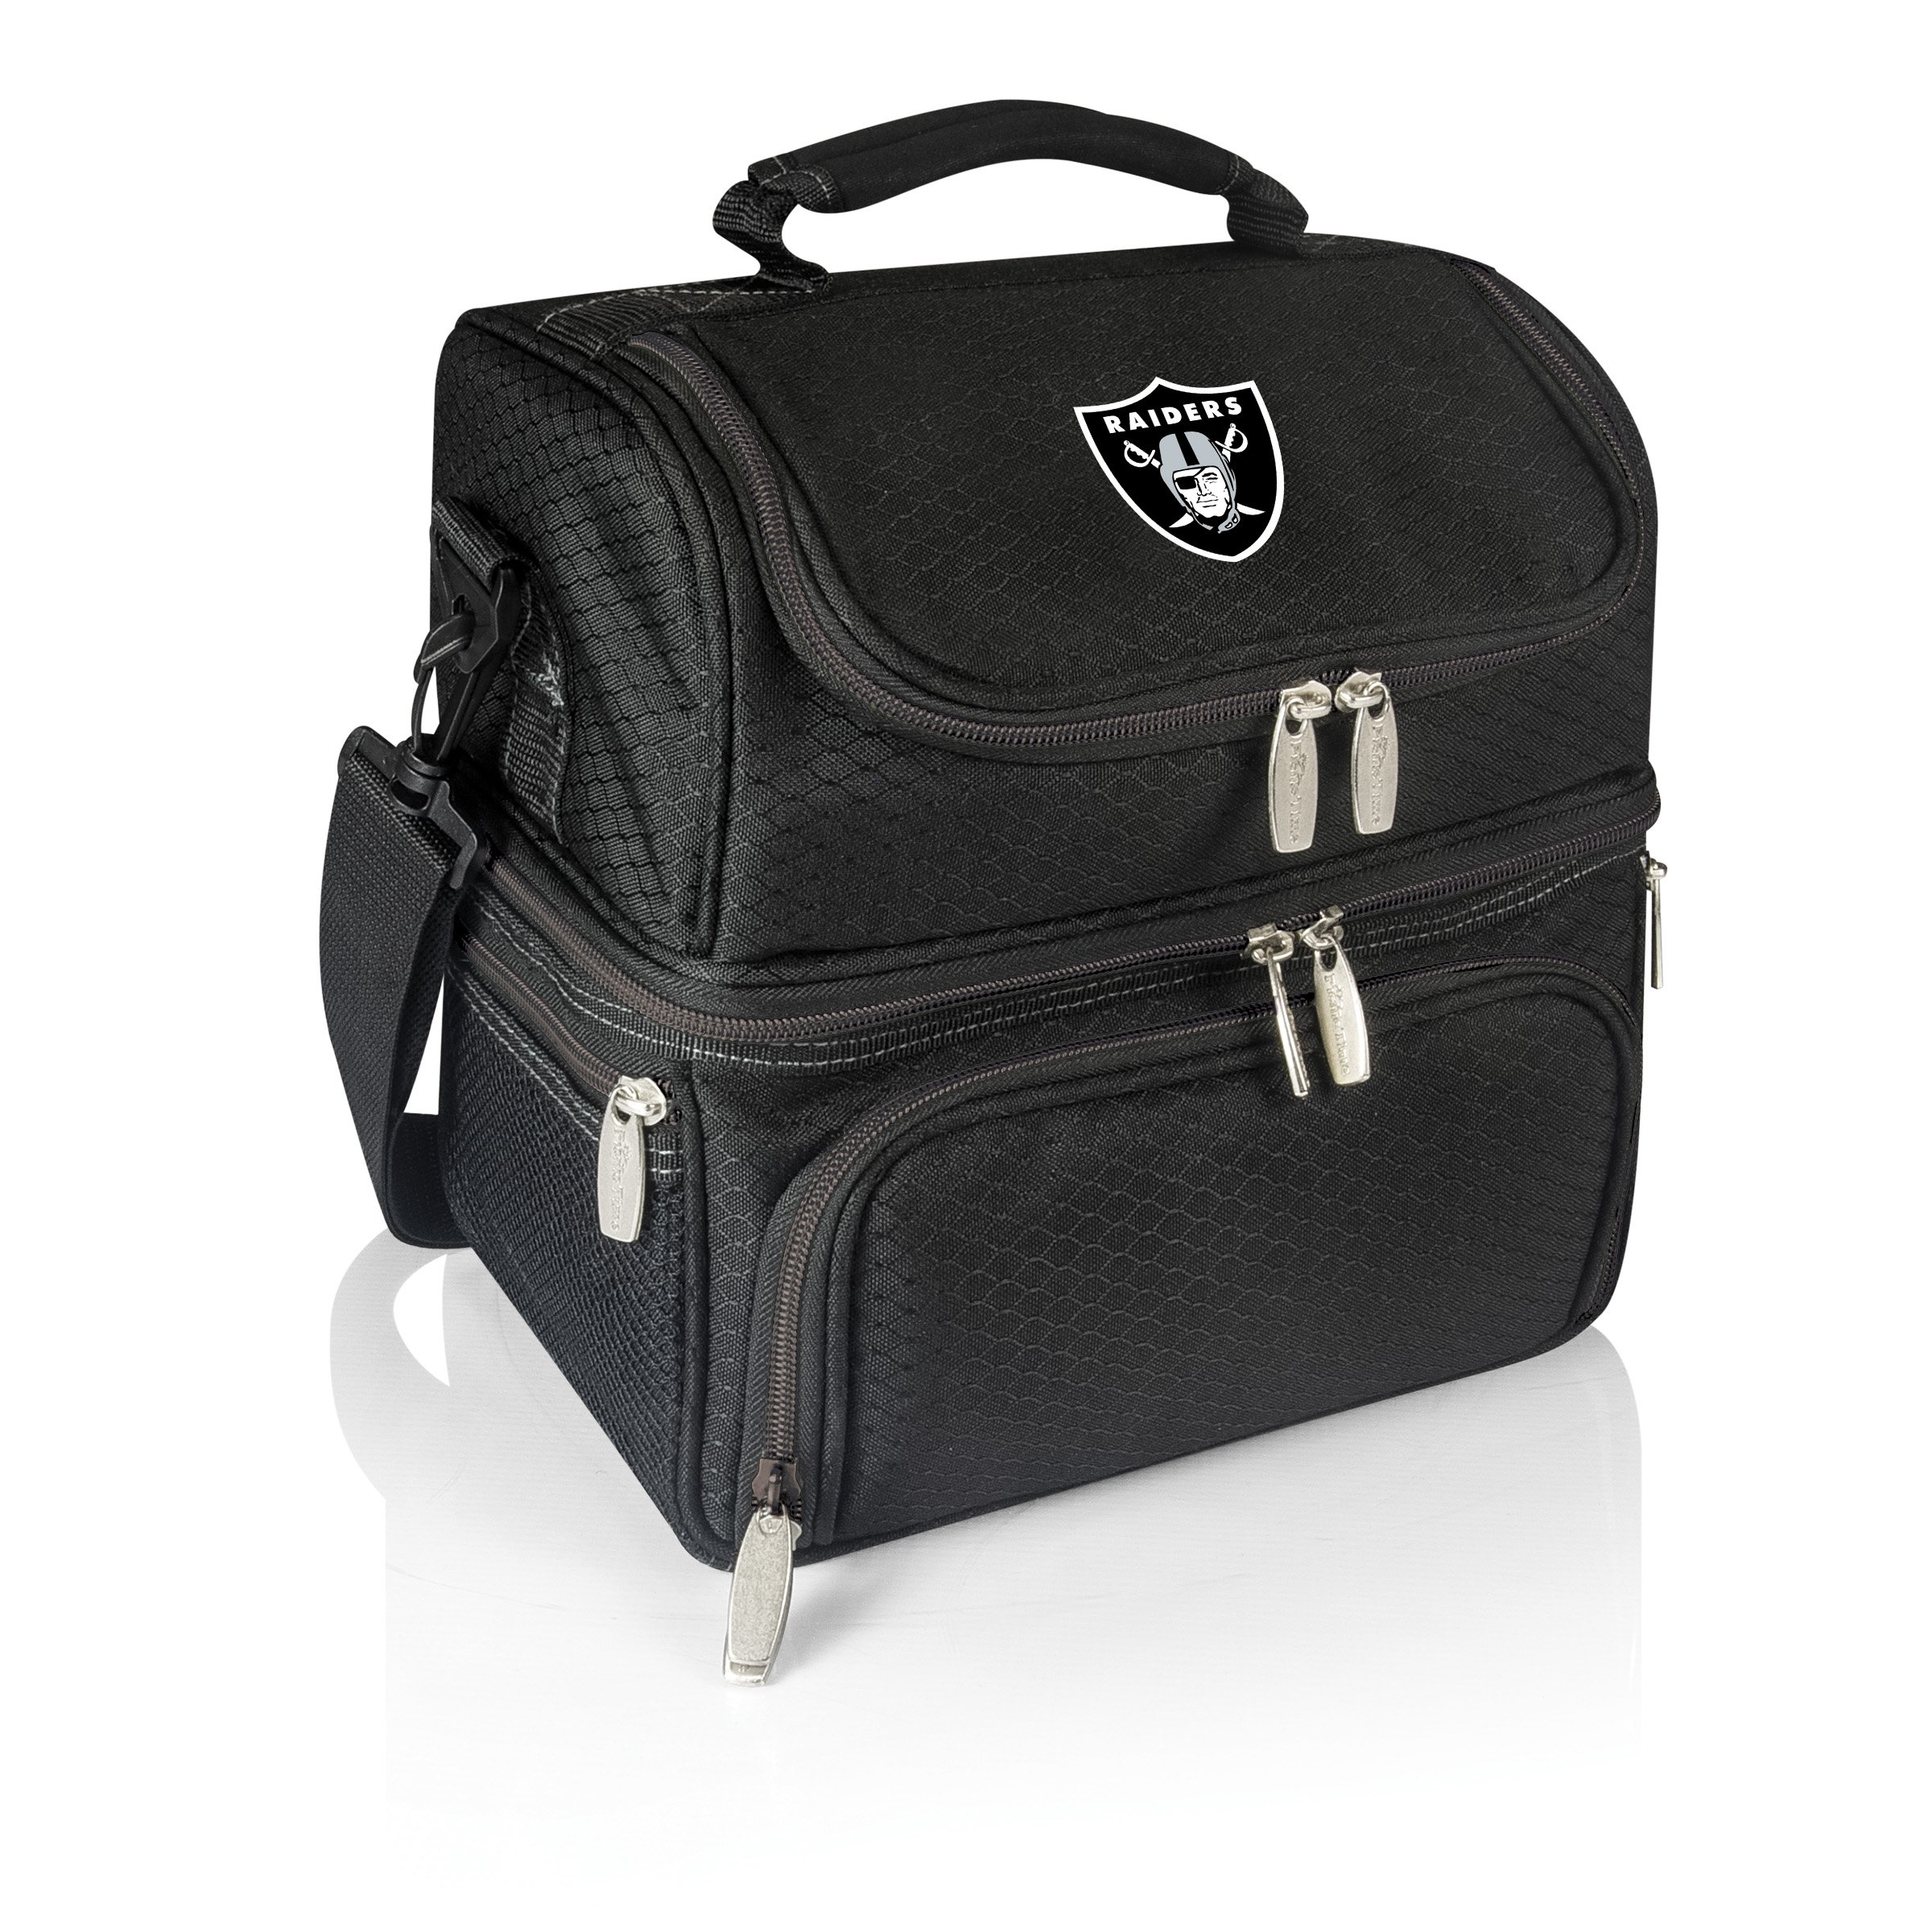 PICNIC TIME NFL Oakland Raiders Digital Print Pranzo Personal Cooler, One Size, Black